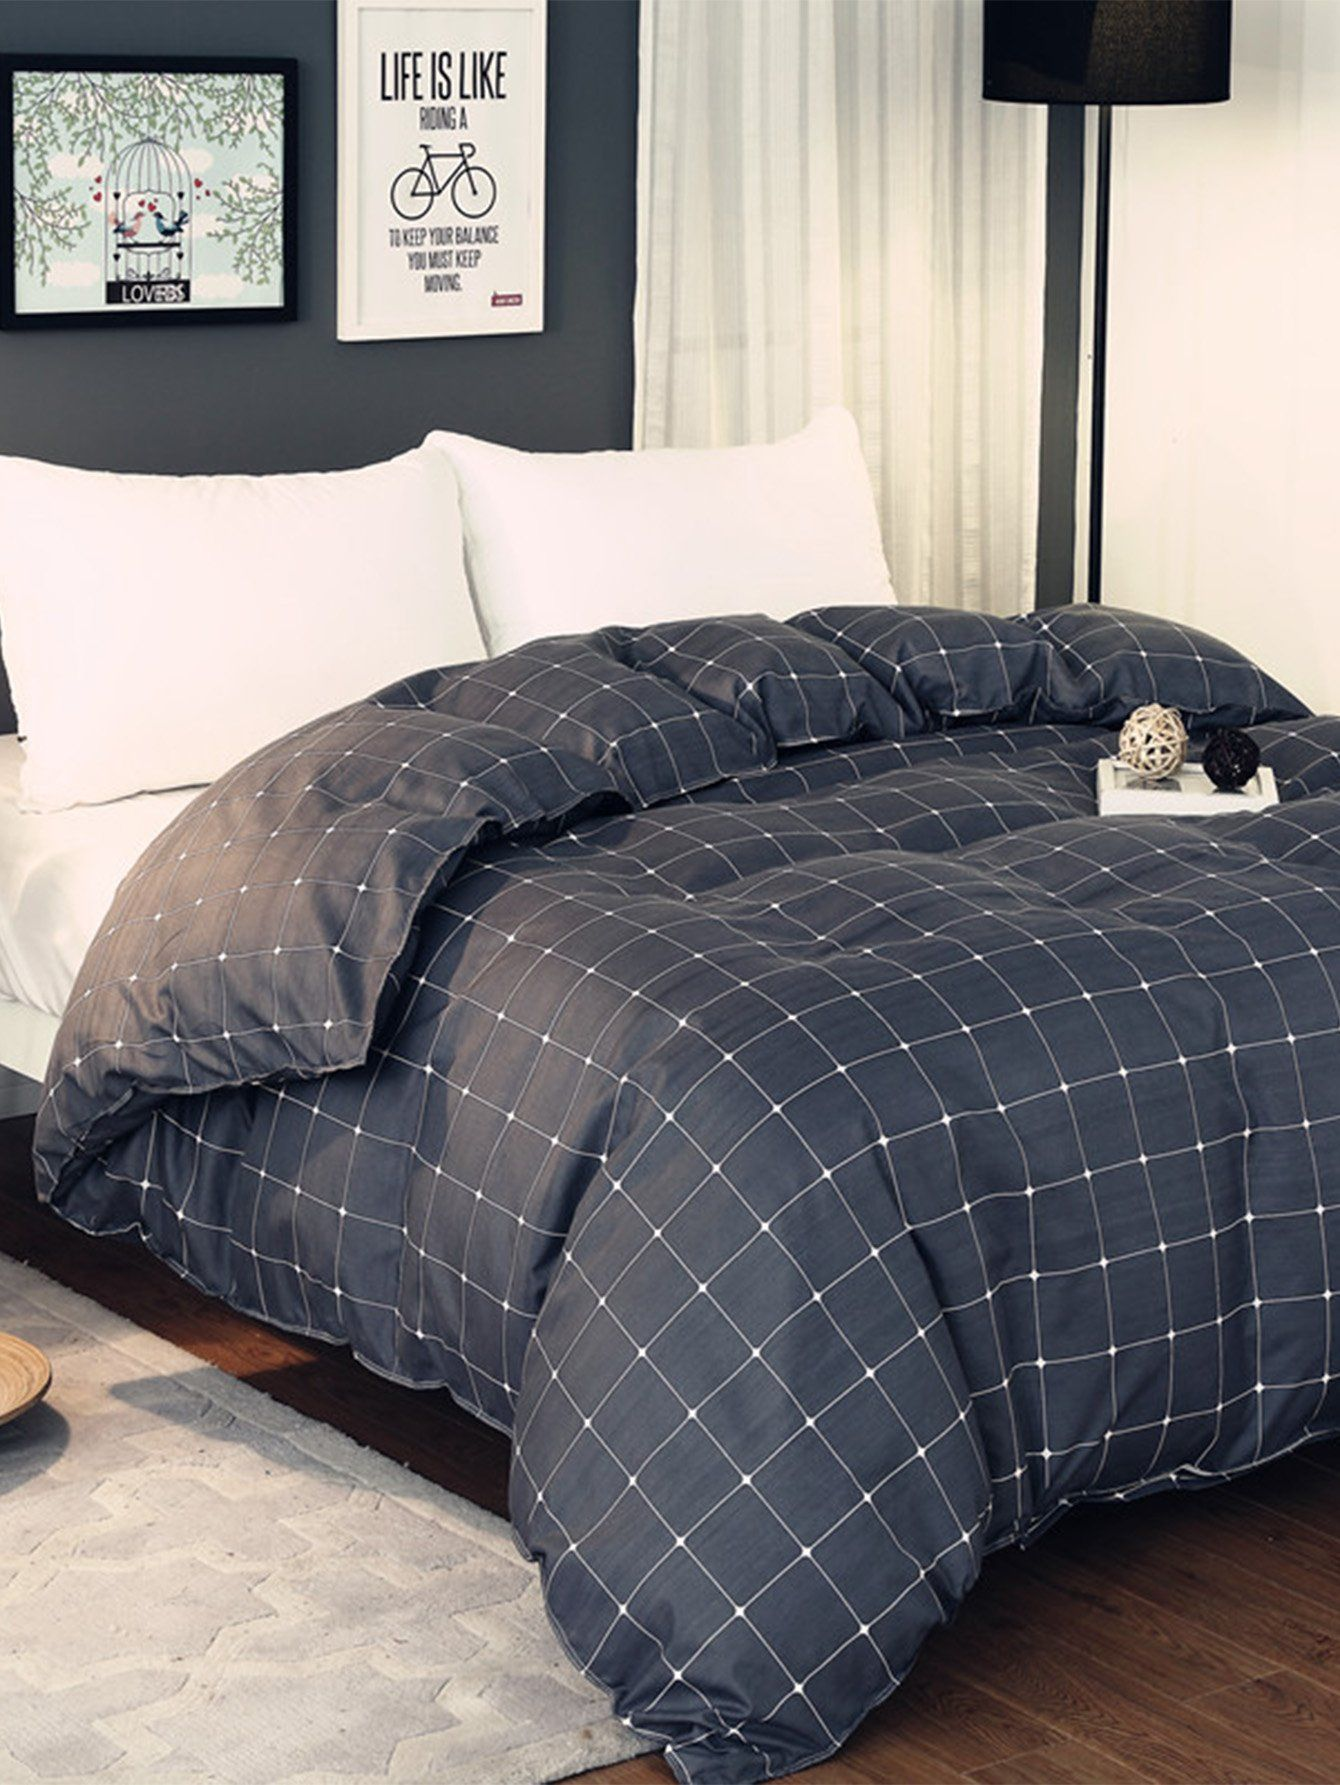 Brilliant 4pcs Bed Set Stripe Plaid Boy Girl Child 1.5m 1.8m 2.0m Full King Queen Twin Double Single Size Bed Sheet Duvet Cover Bedlinens Solar